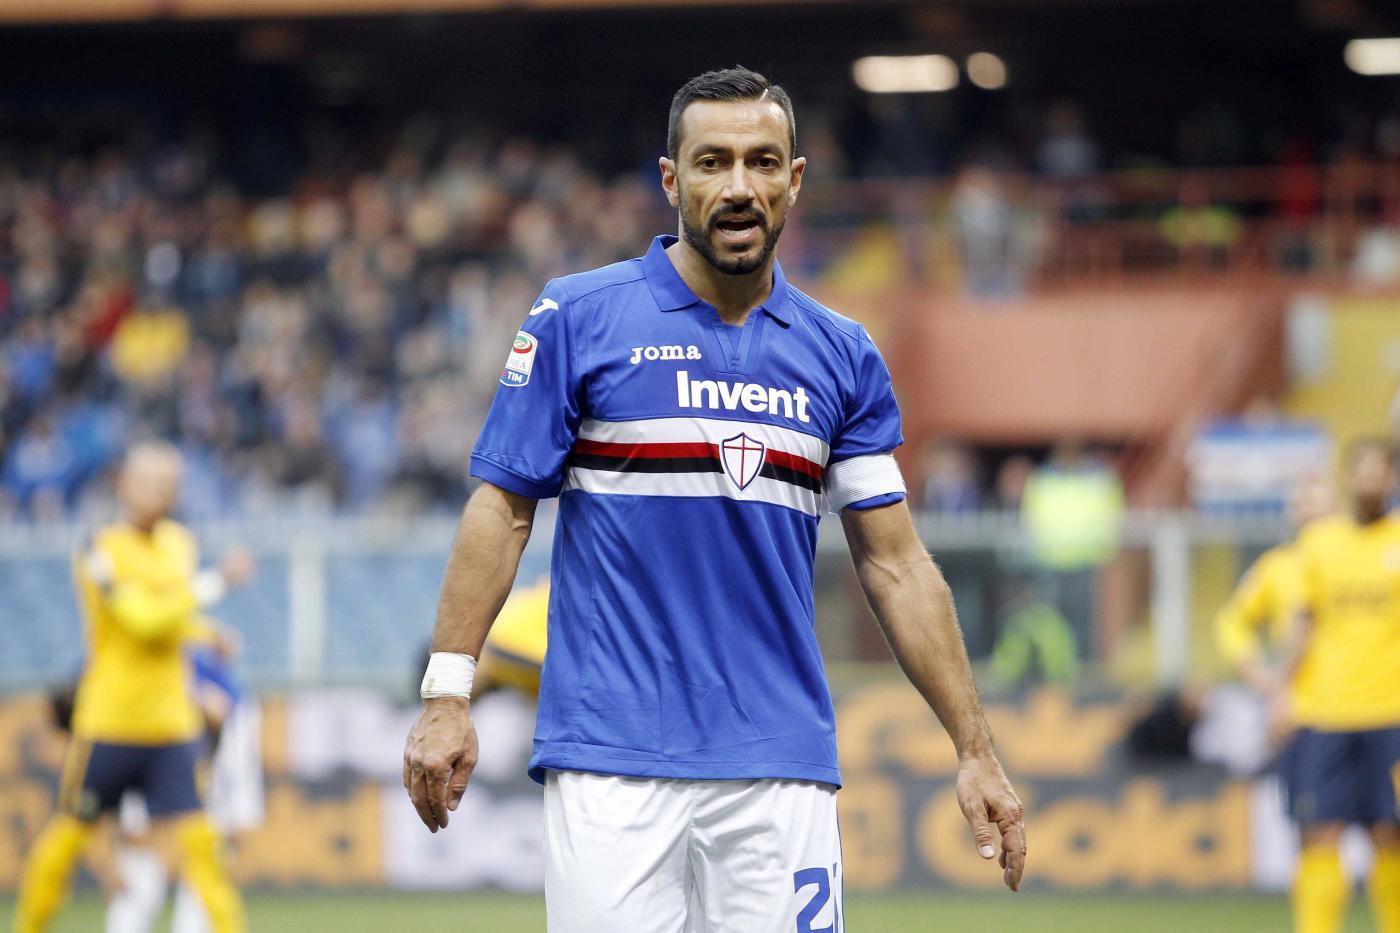 Genoa-Sampdoria, pronostico ed ultime dai campi del match di Serie A